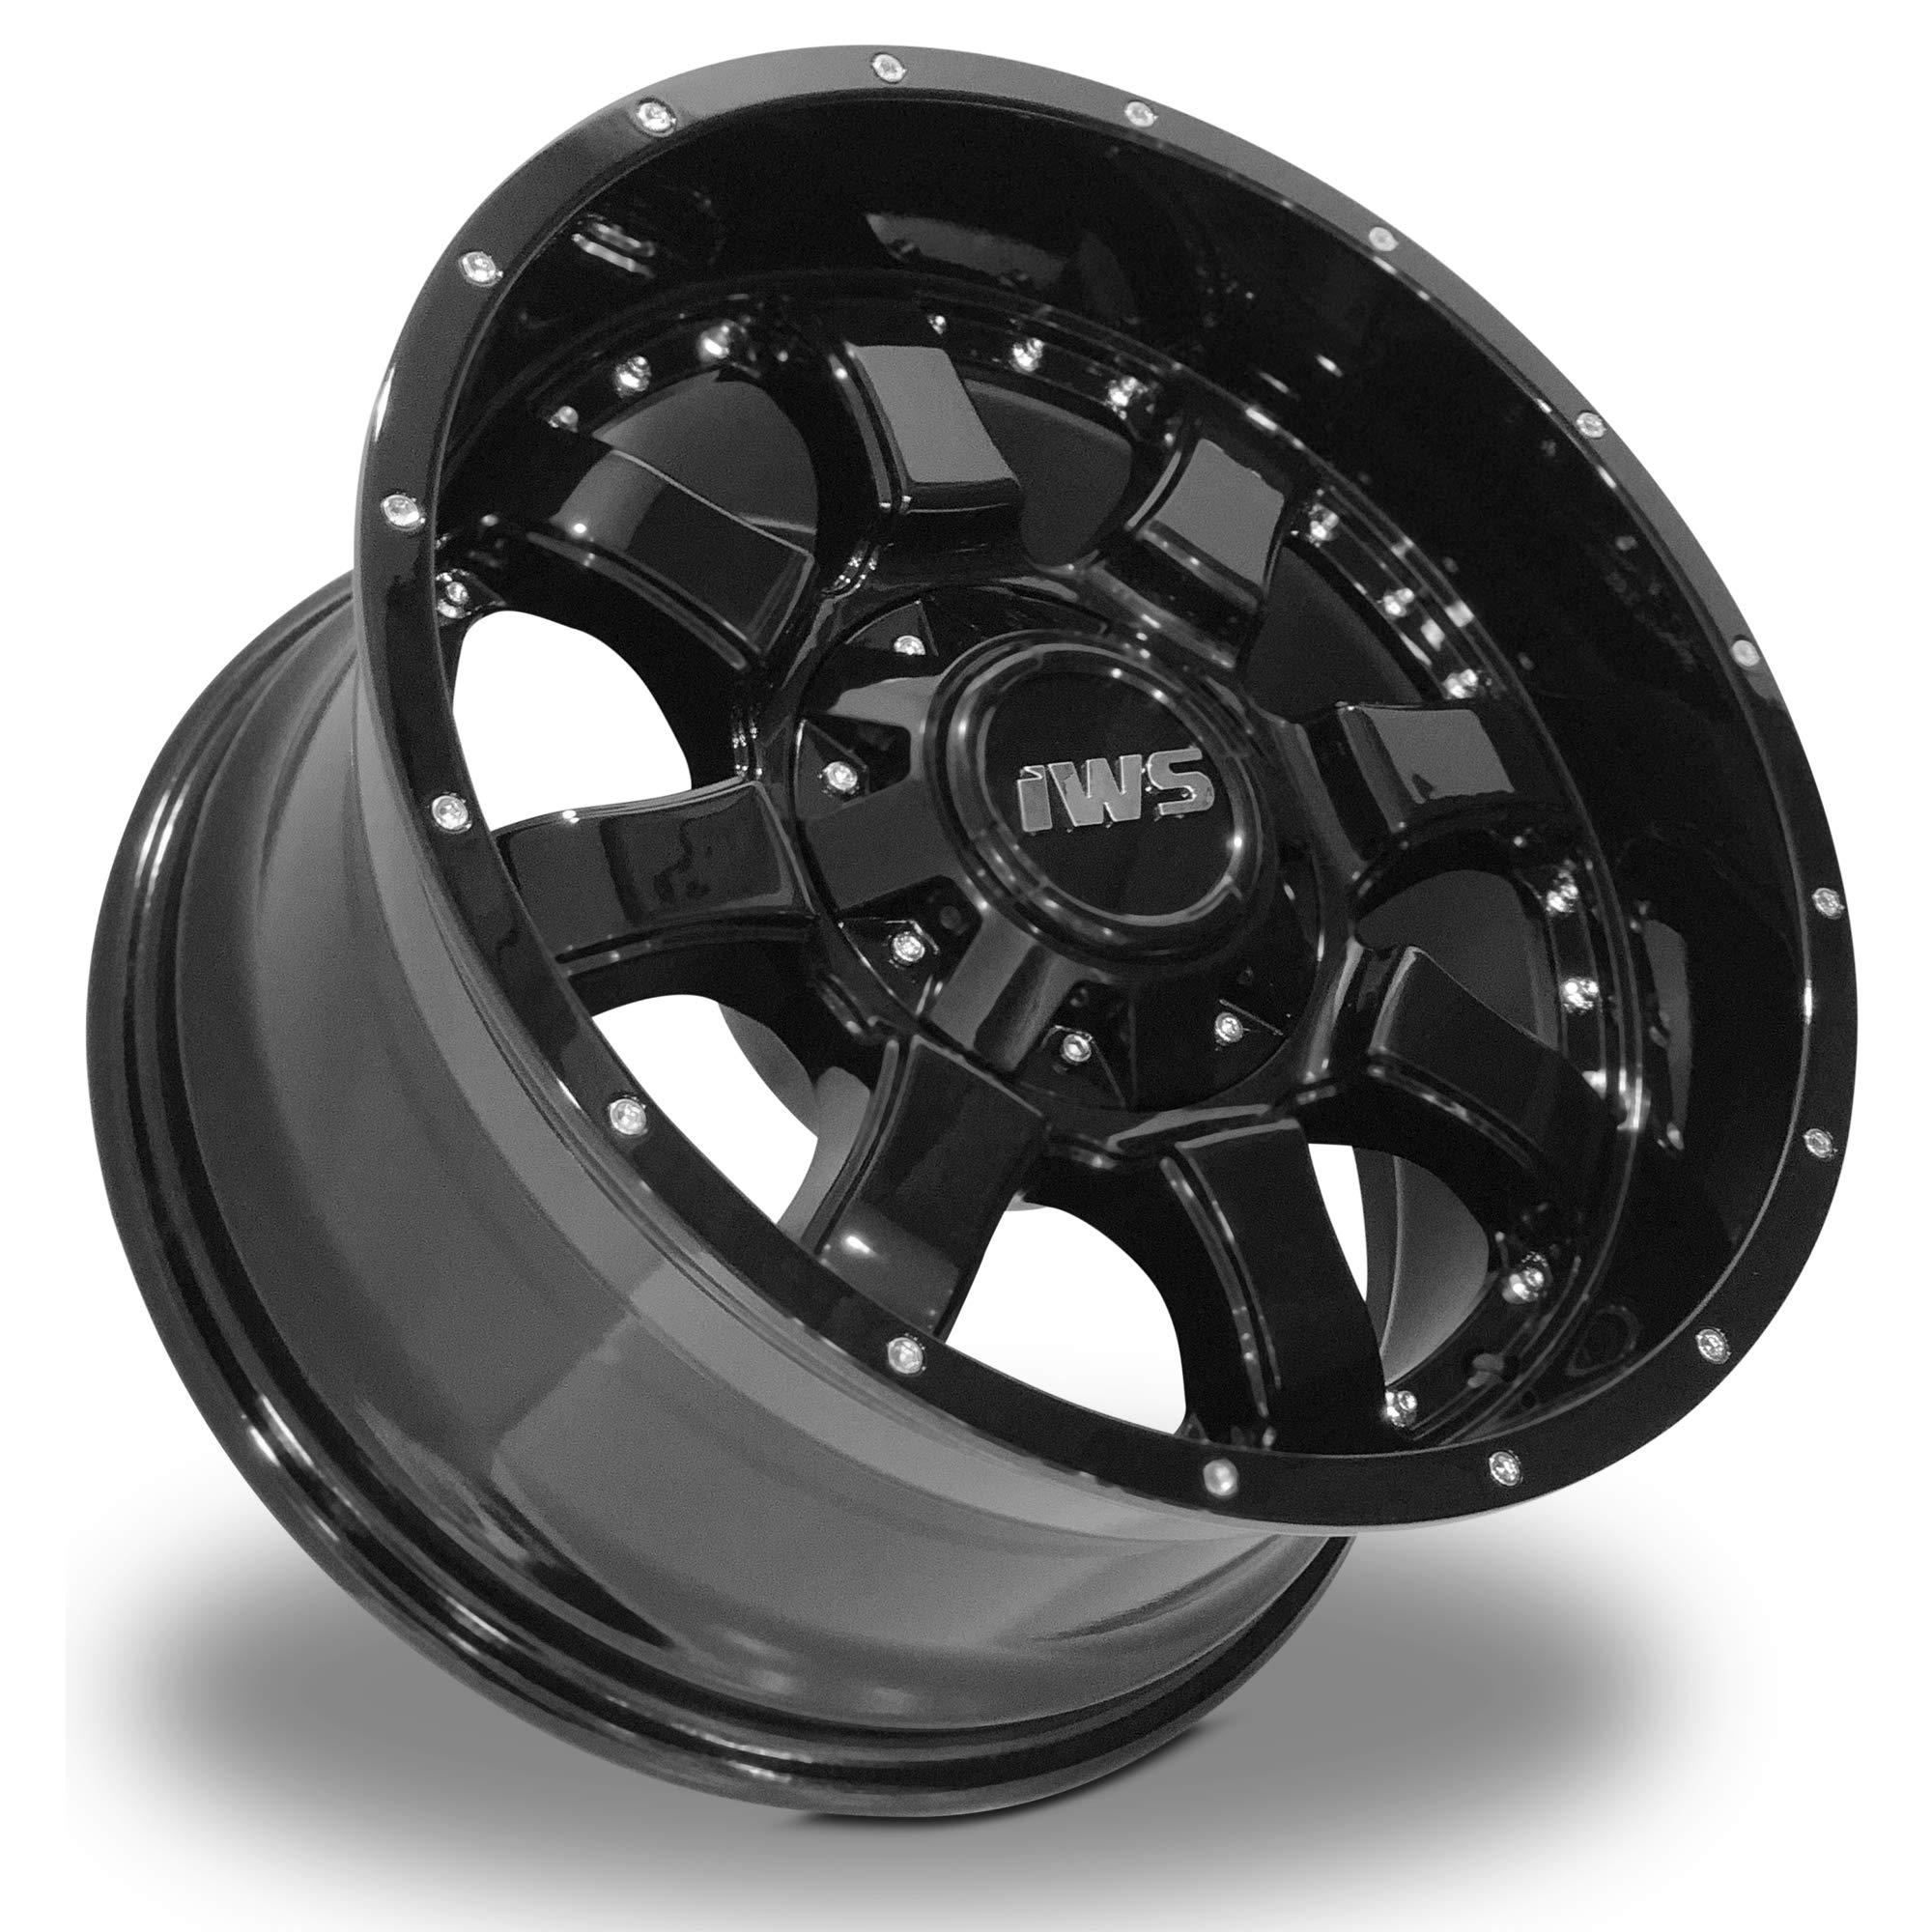 IWS 17x9 Series 5005 6x135 6X139.7-12mm Painted Black Wheel/Rim